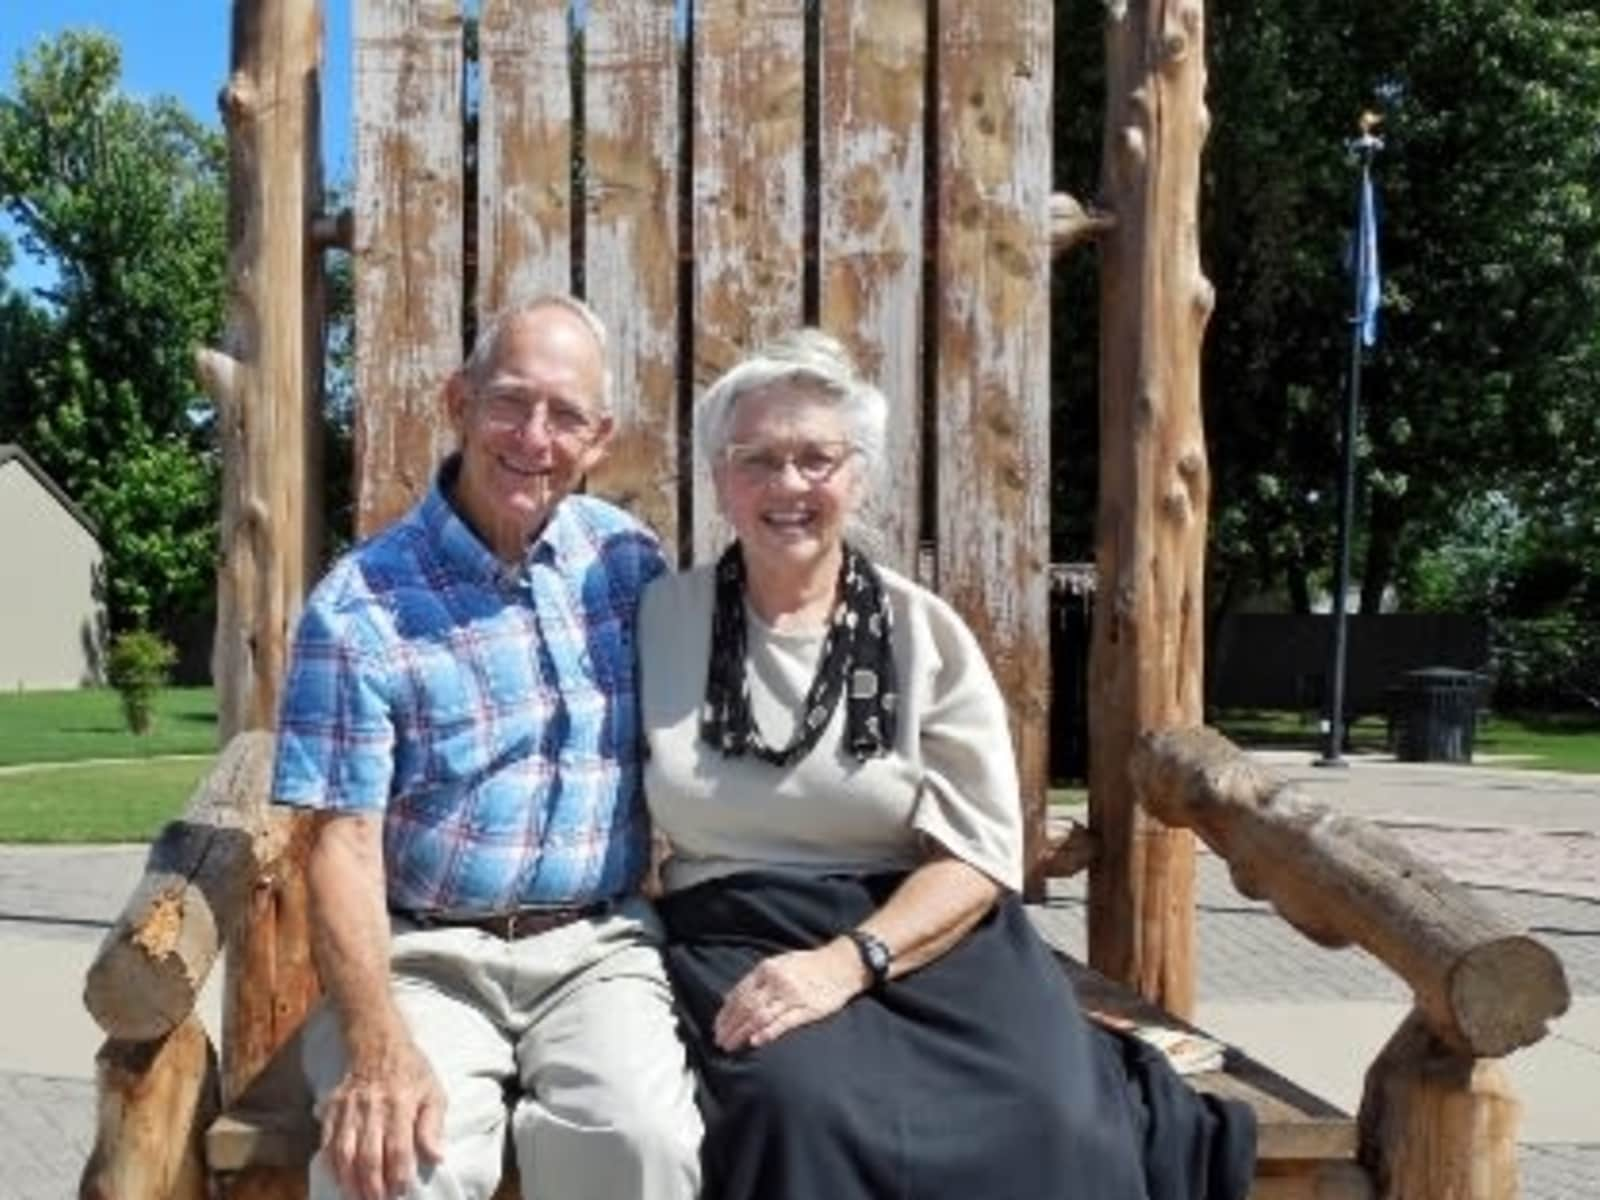 Duane & joan & Duane from Houston, Texas, United States